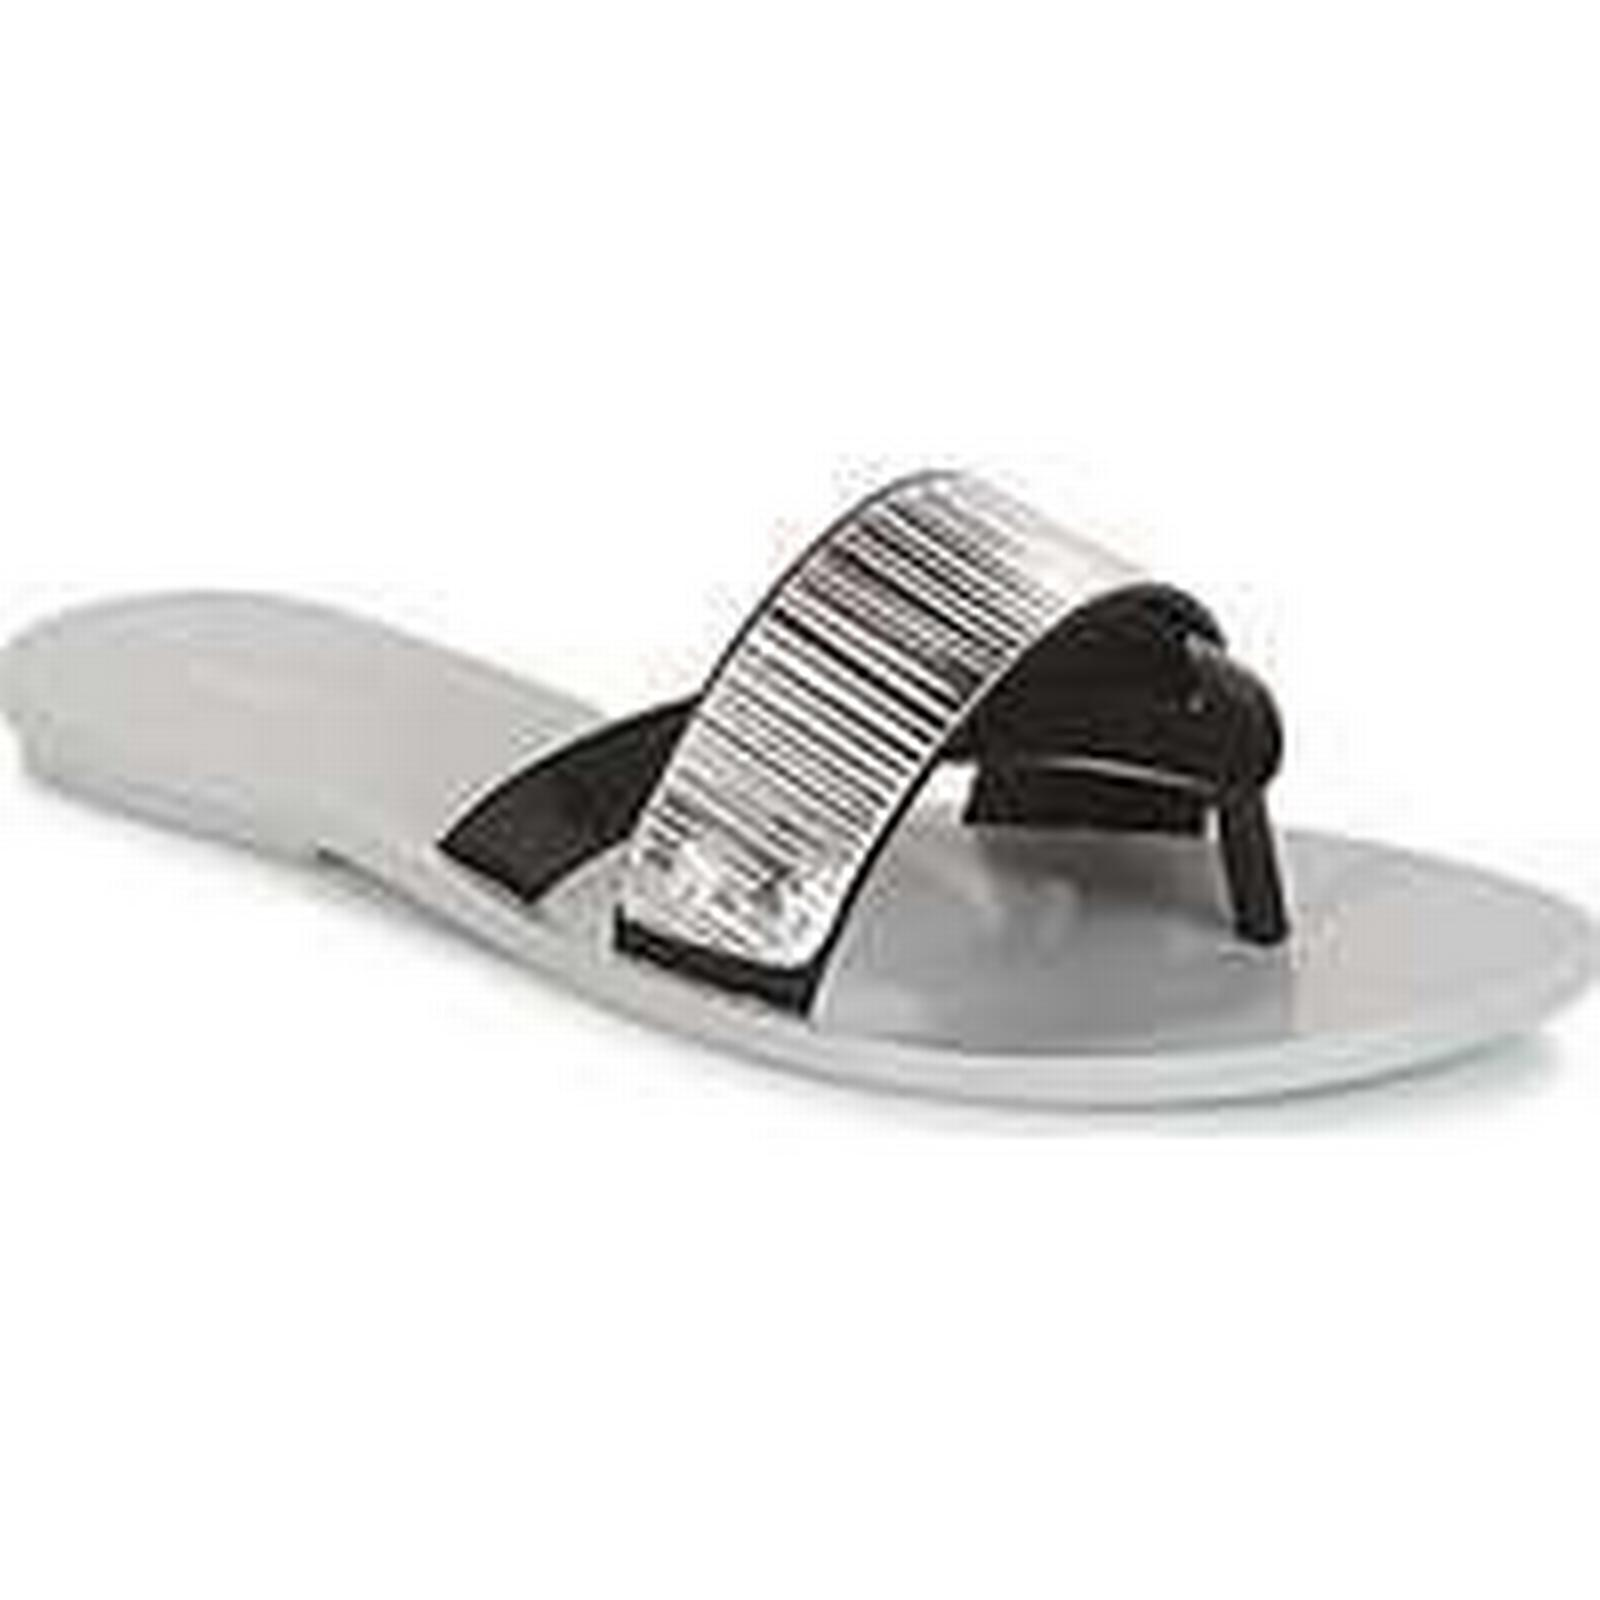 cf724a583732 Spartoo.co.uk Melissa CREAM SP AD women s women s women s Flip flops    Sandals ...